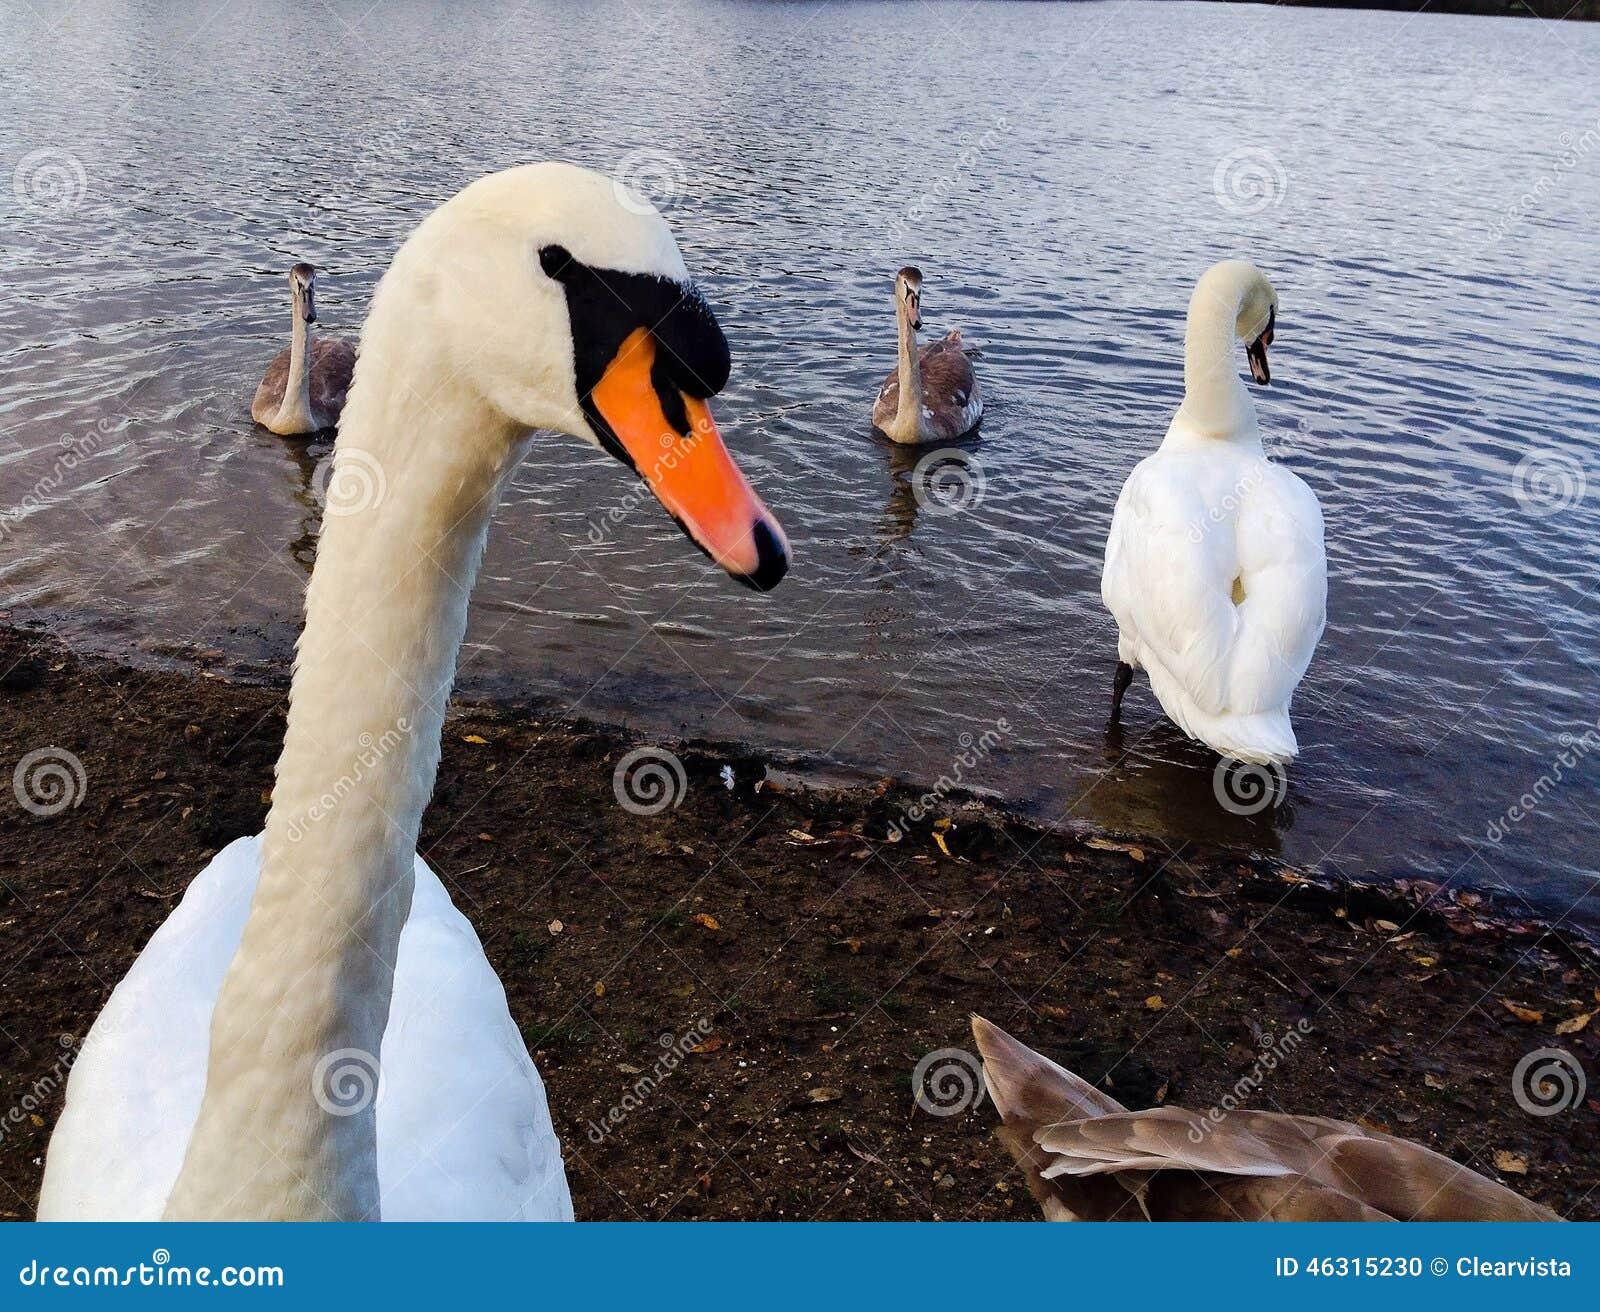 Swans head close up looking at the camera.